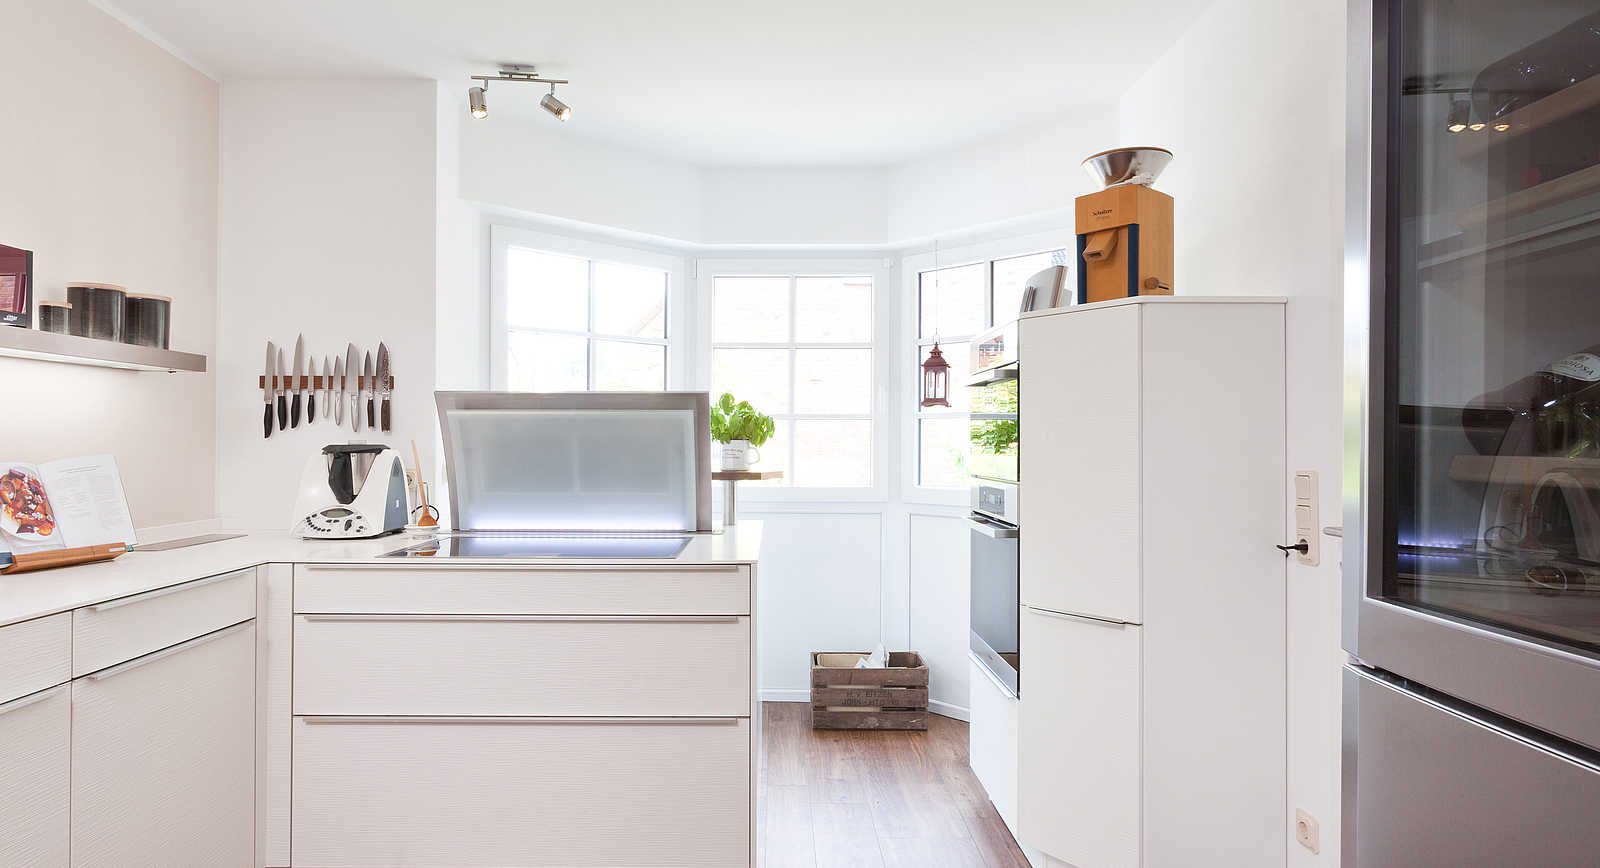 k che bergisch gladbach k chen galerie bonn. Black Bedroom Furniture Sets. Home Design Ideas